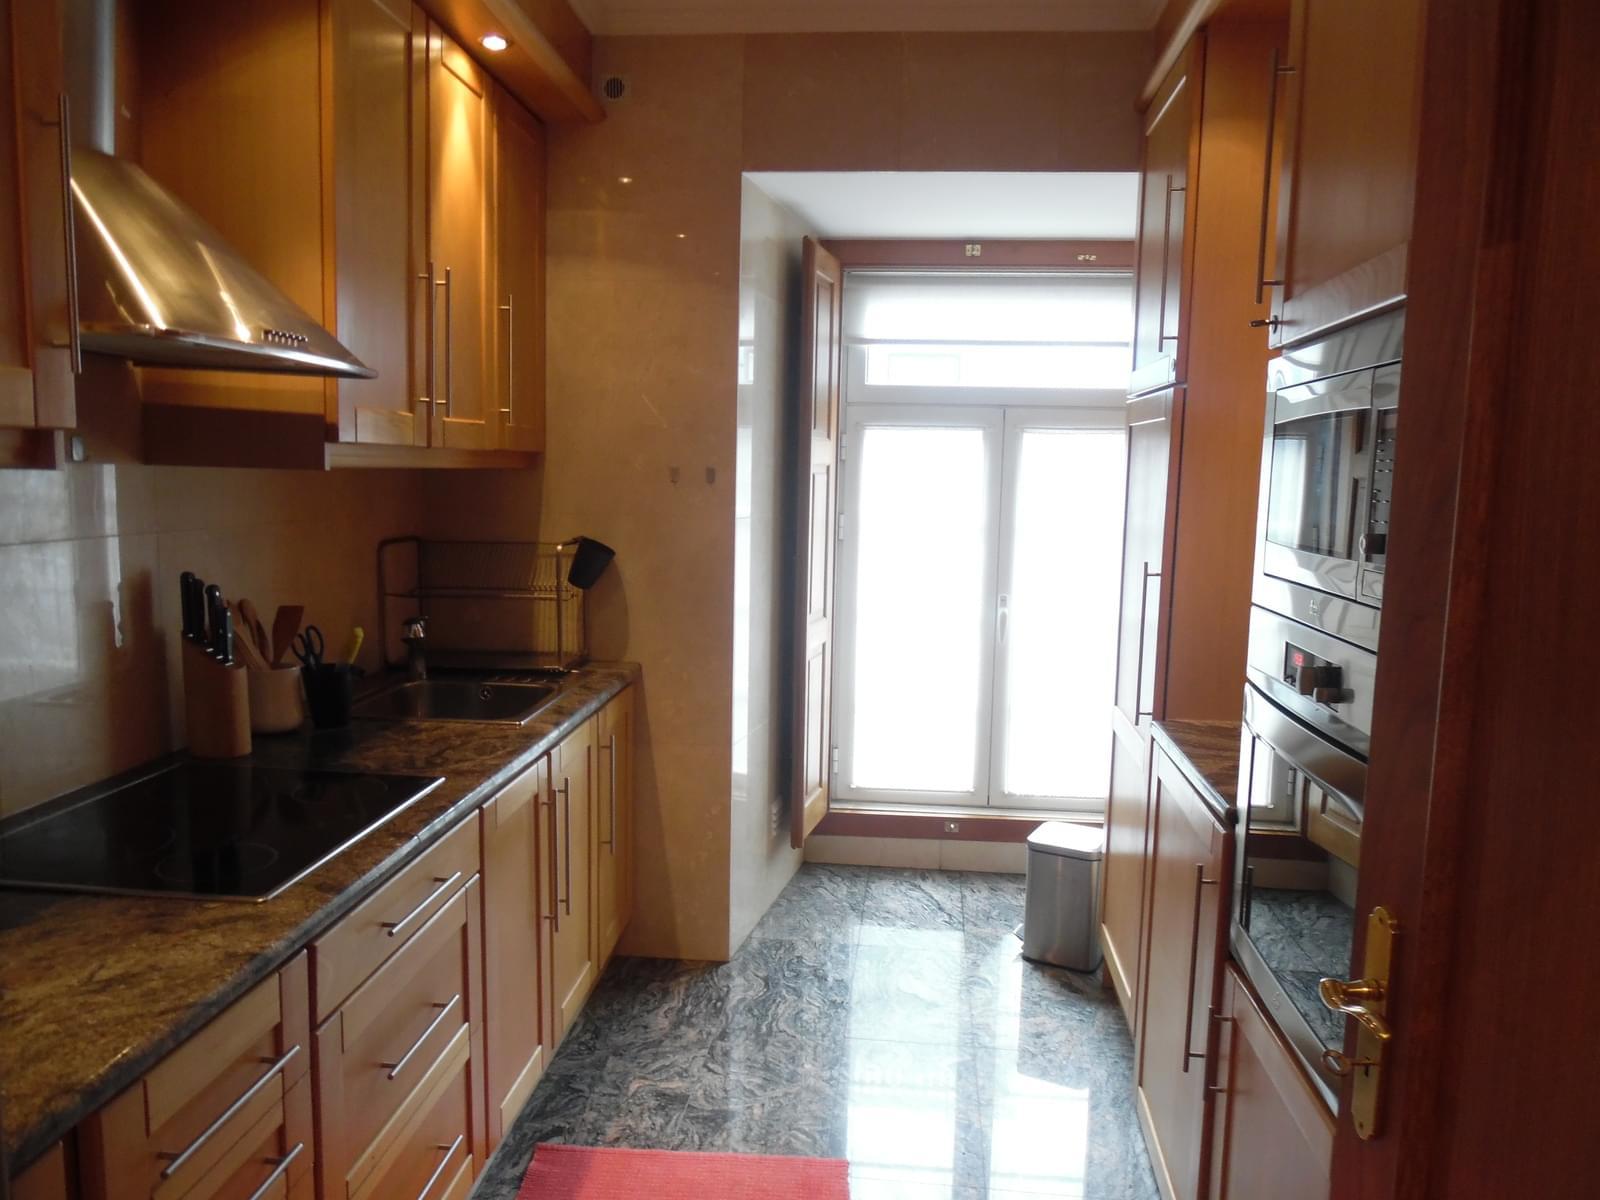 pf16905-apartamento-t1-lisboa-2a01aa94-76e3-4feb-9699-5fcd85620de1